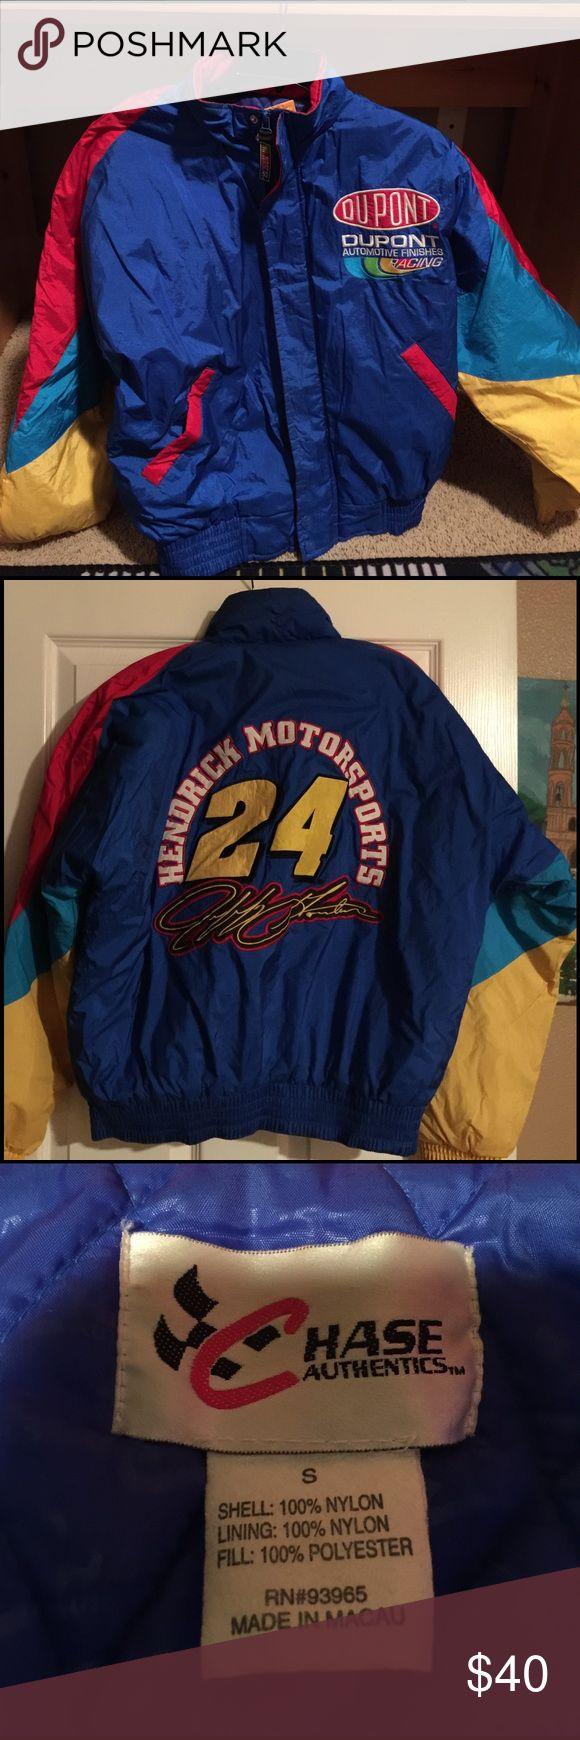 NASCAR jacket Jeff Gordon Small NASCAR jacket Jackets & Coats Puffers